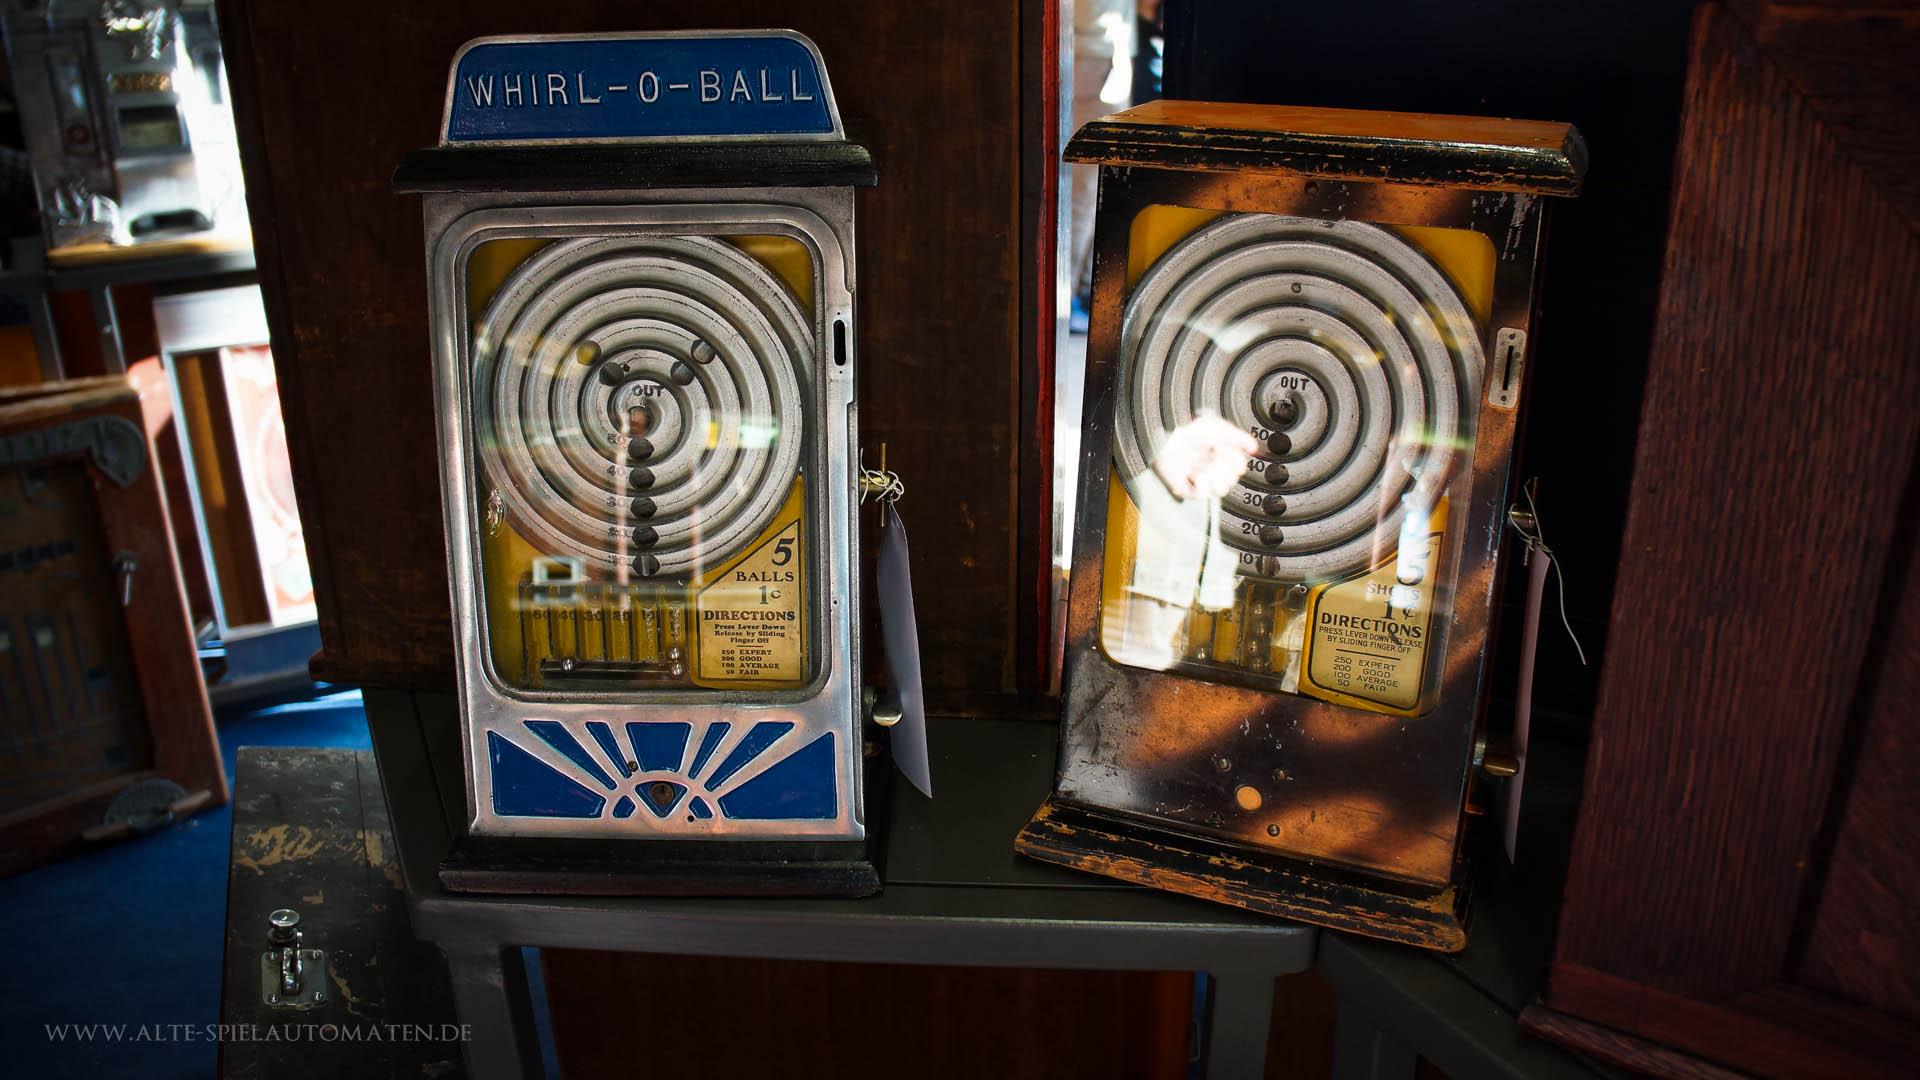 Slots 7 free spins